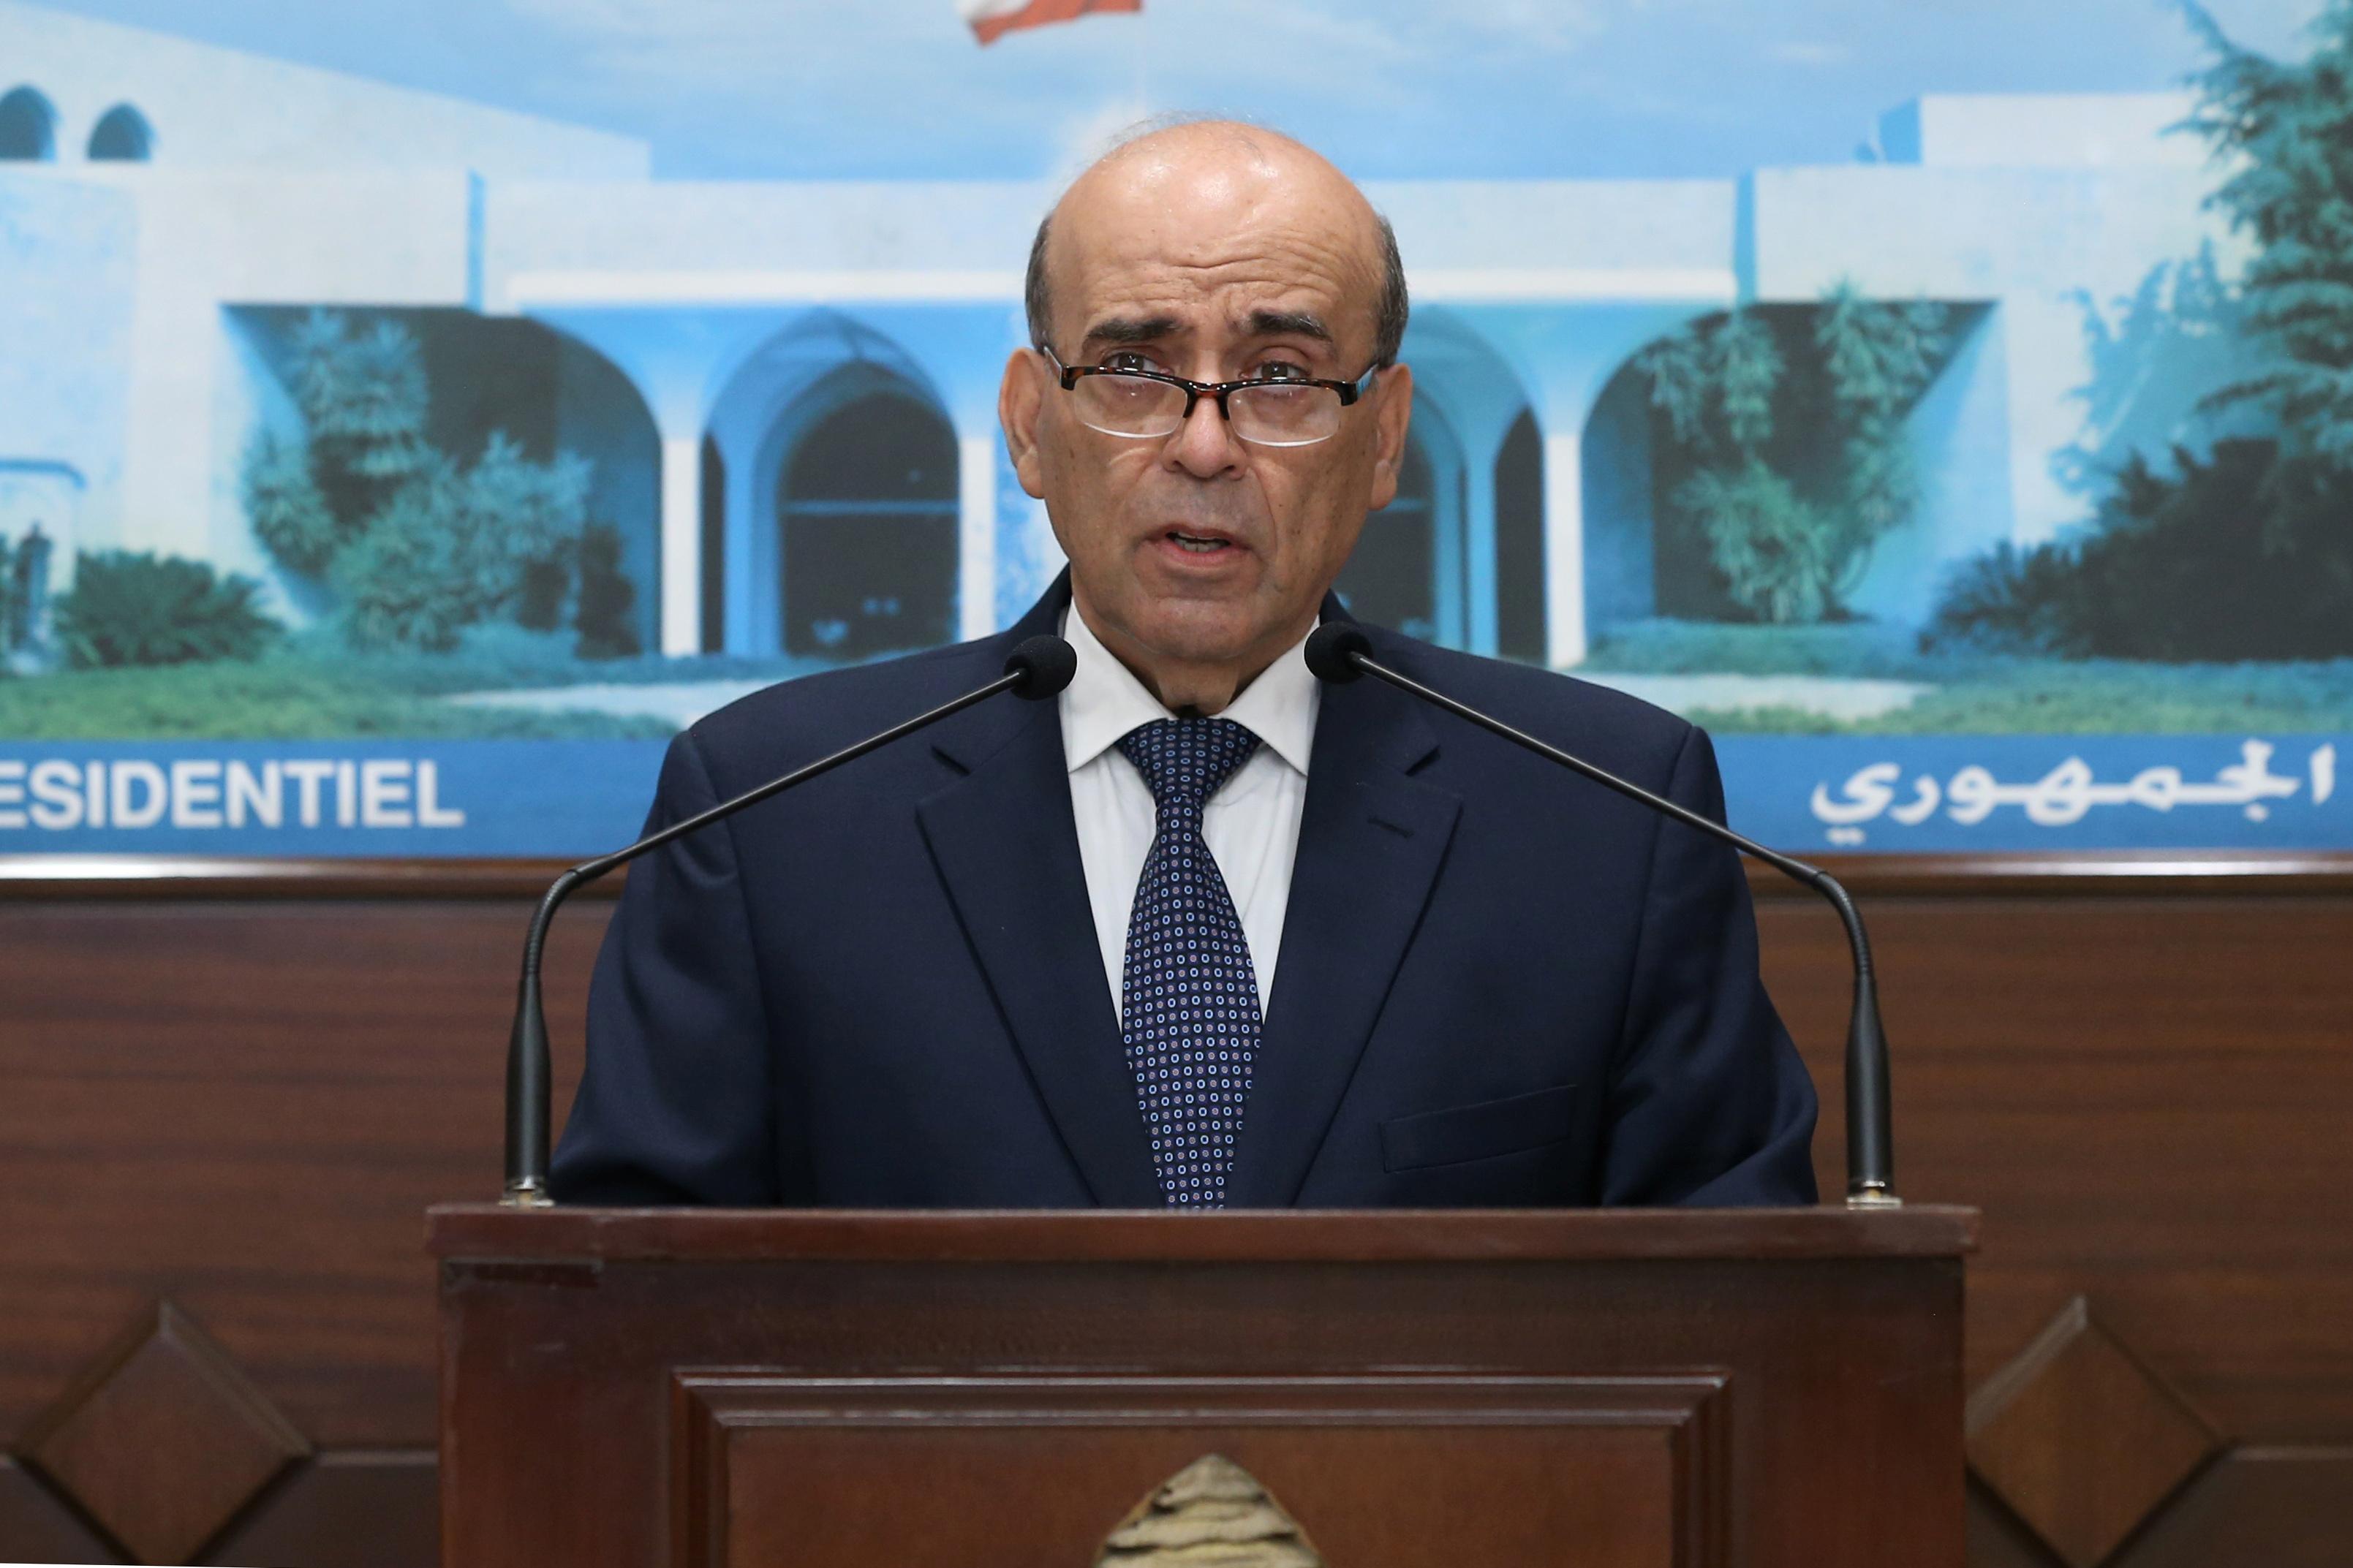 Charbel Wehbe, Lebanon's caretaker foreign minister, talks at the presidential palace in Baabda, Lebanon, May 19, 2021. Dalati Nohra/Handout via REUTERS